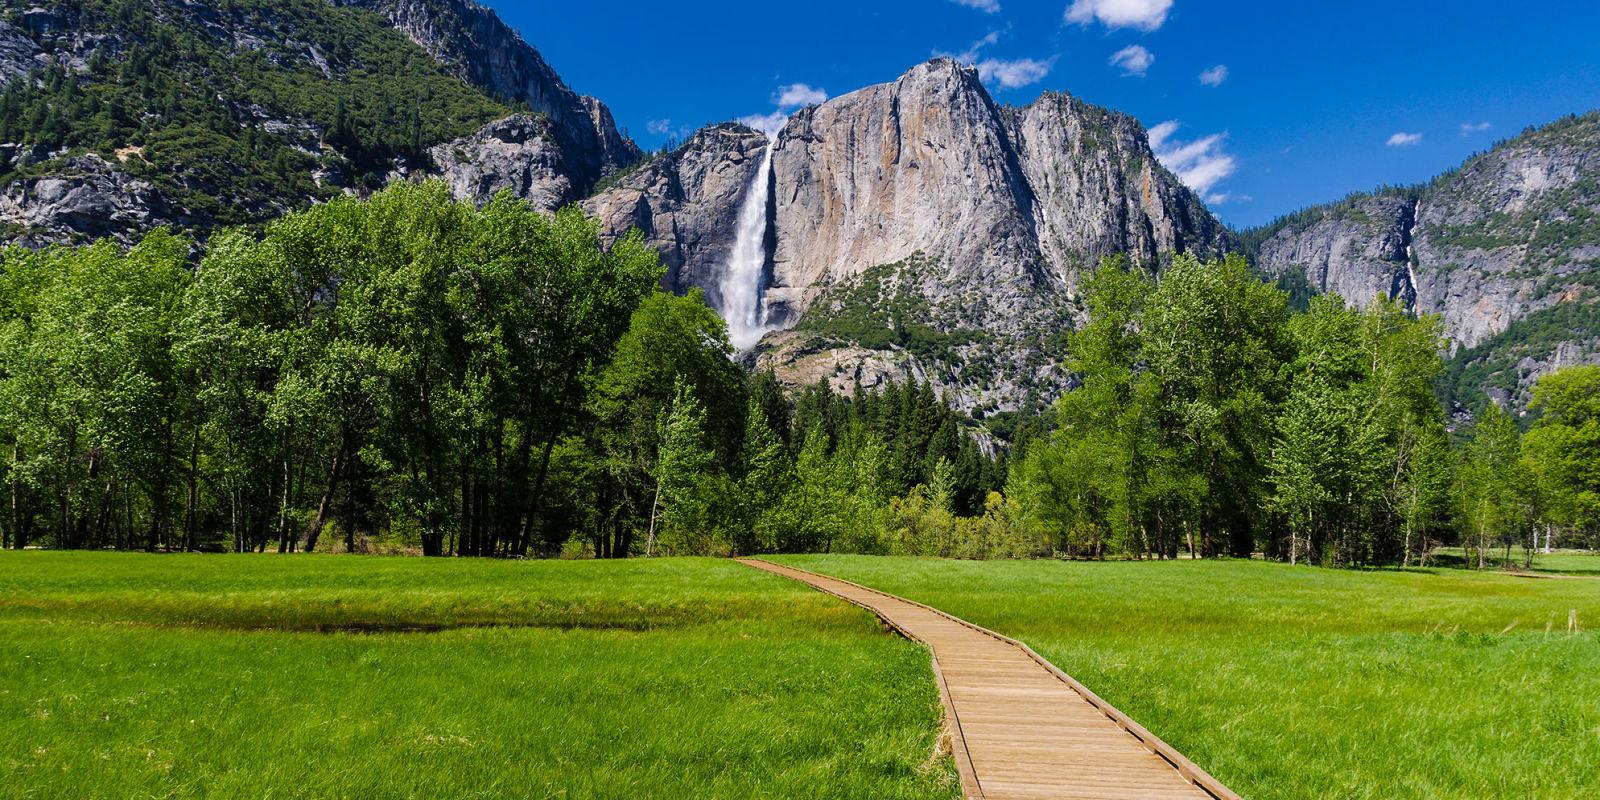 11 Best National Parks For 2018 Scenic National Parks